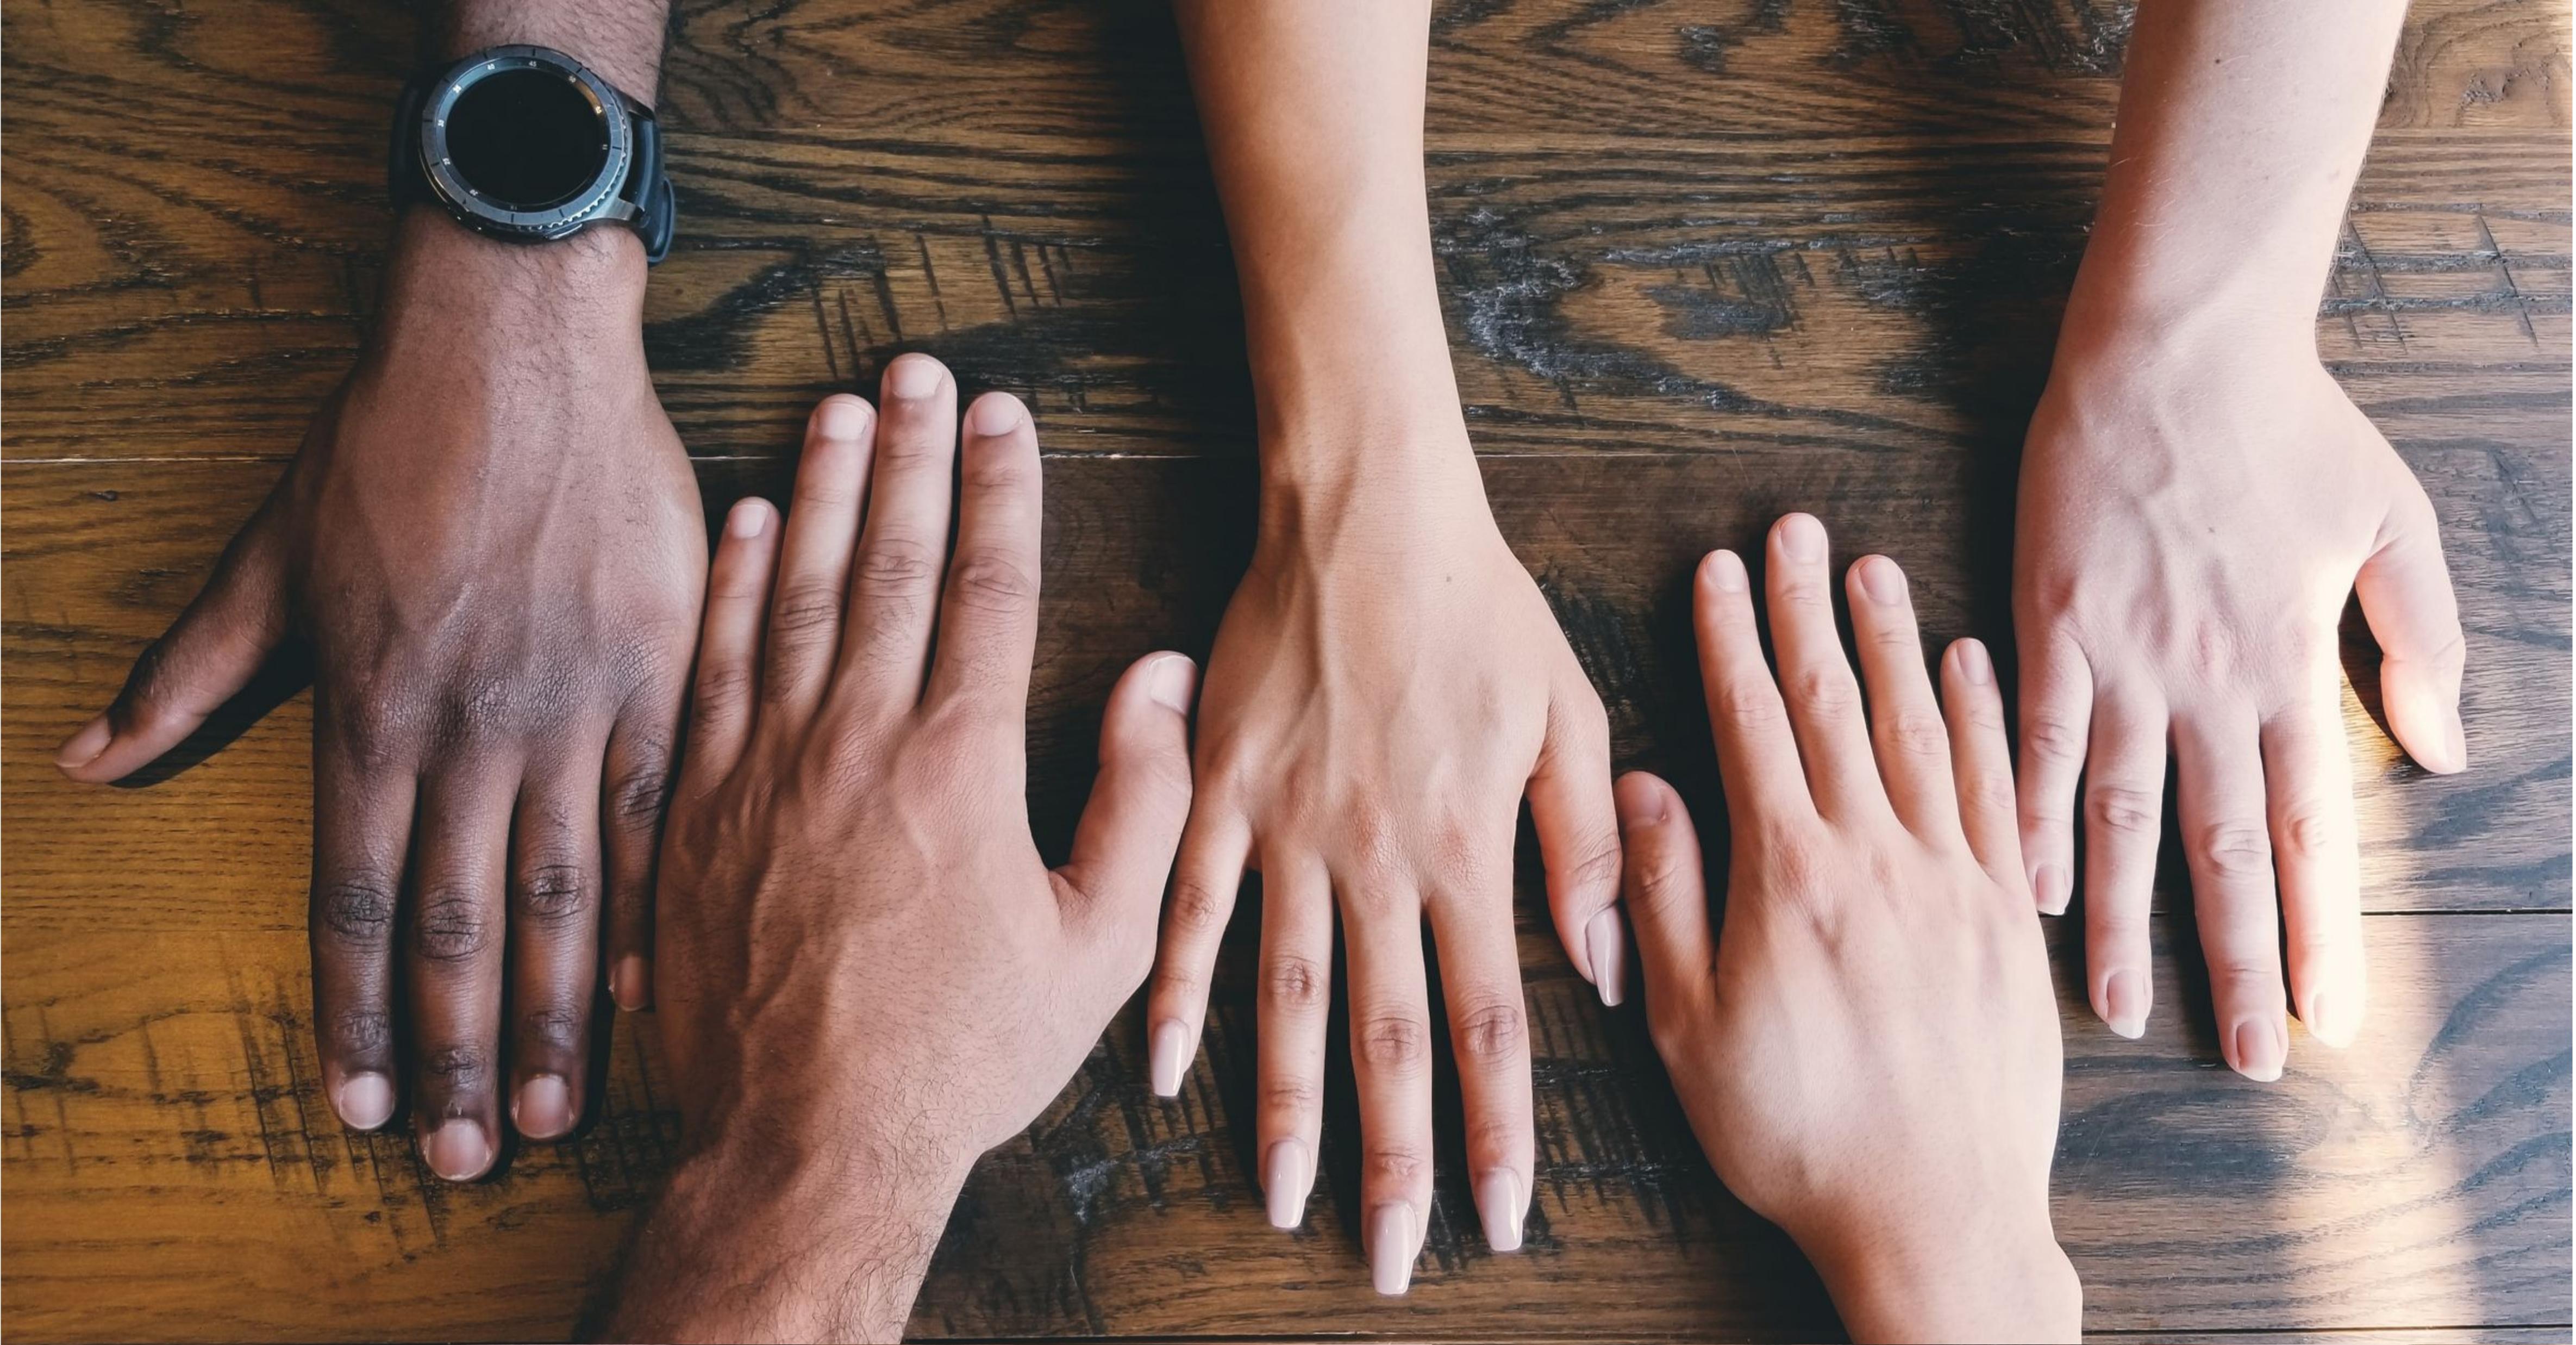 Coursetune and Academic Partnerships Align